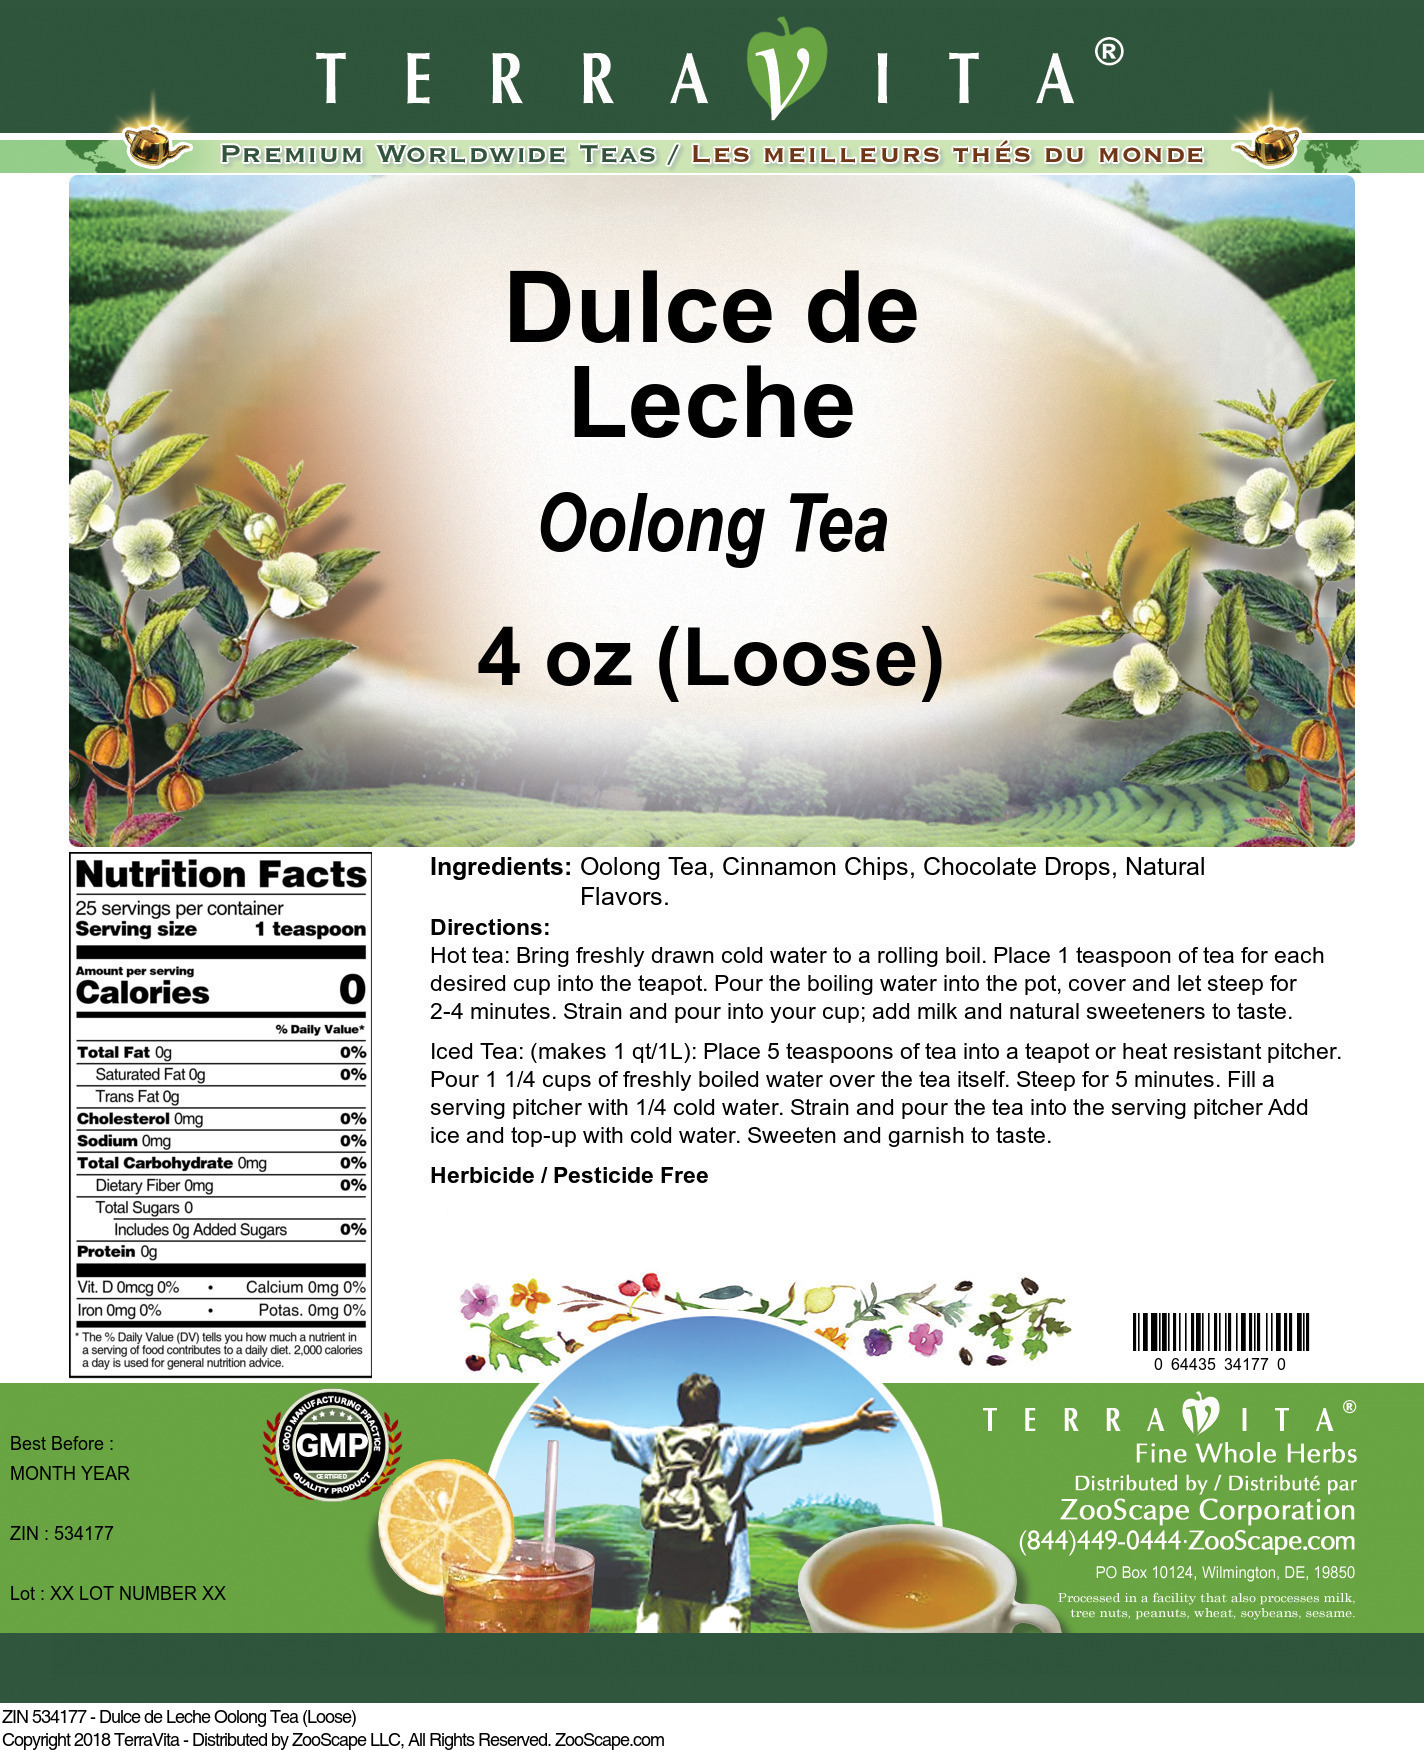 Dulce de Leche Oolong Tea (Loose)